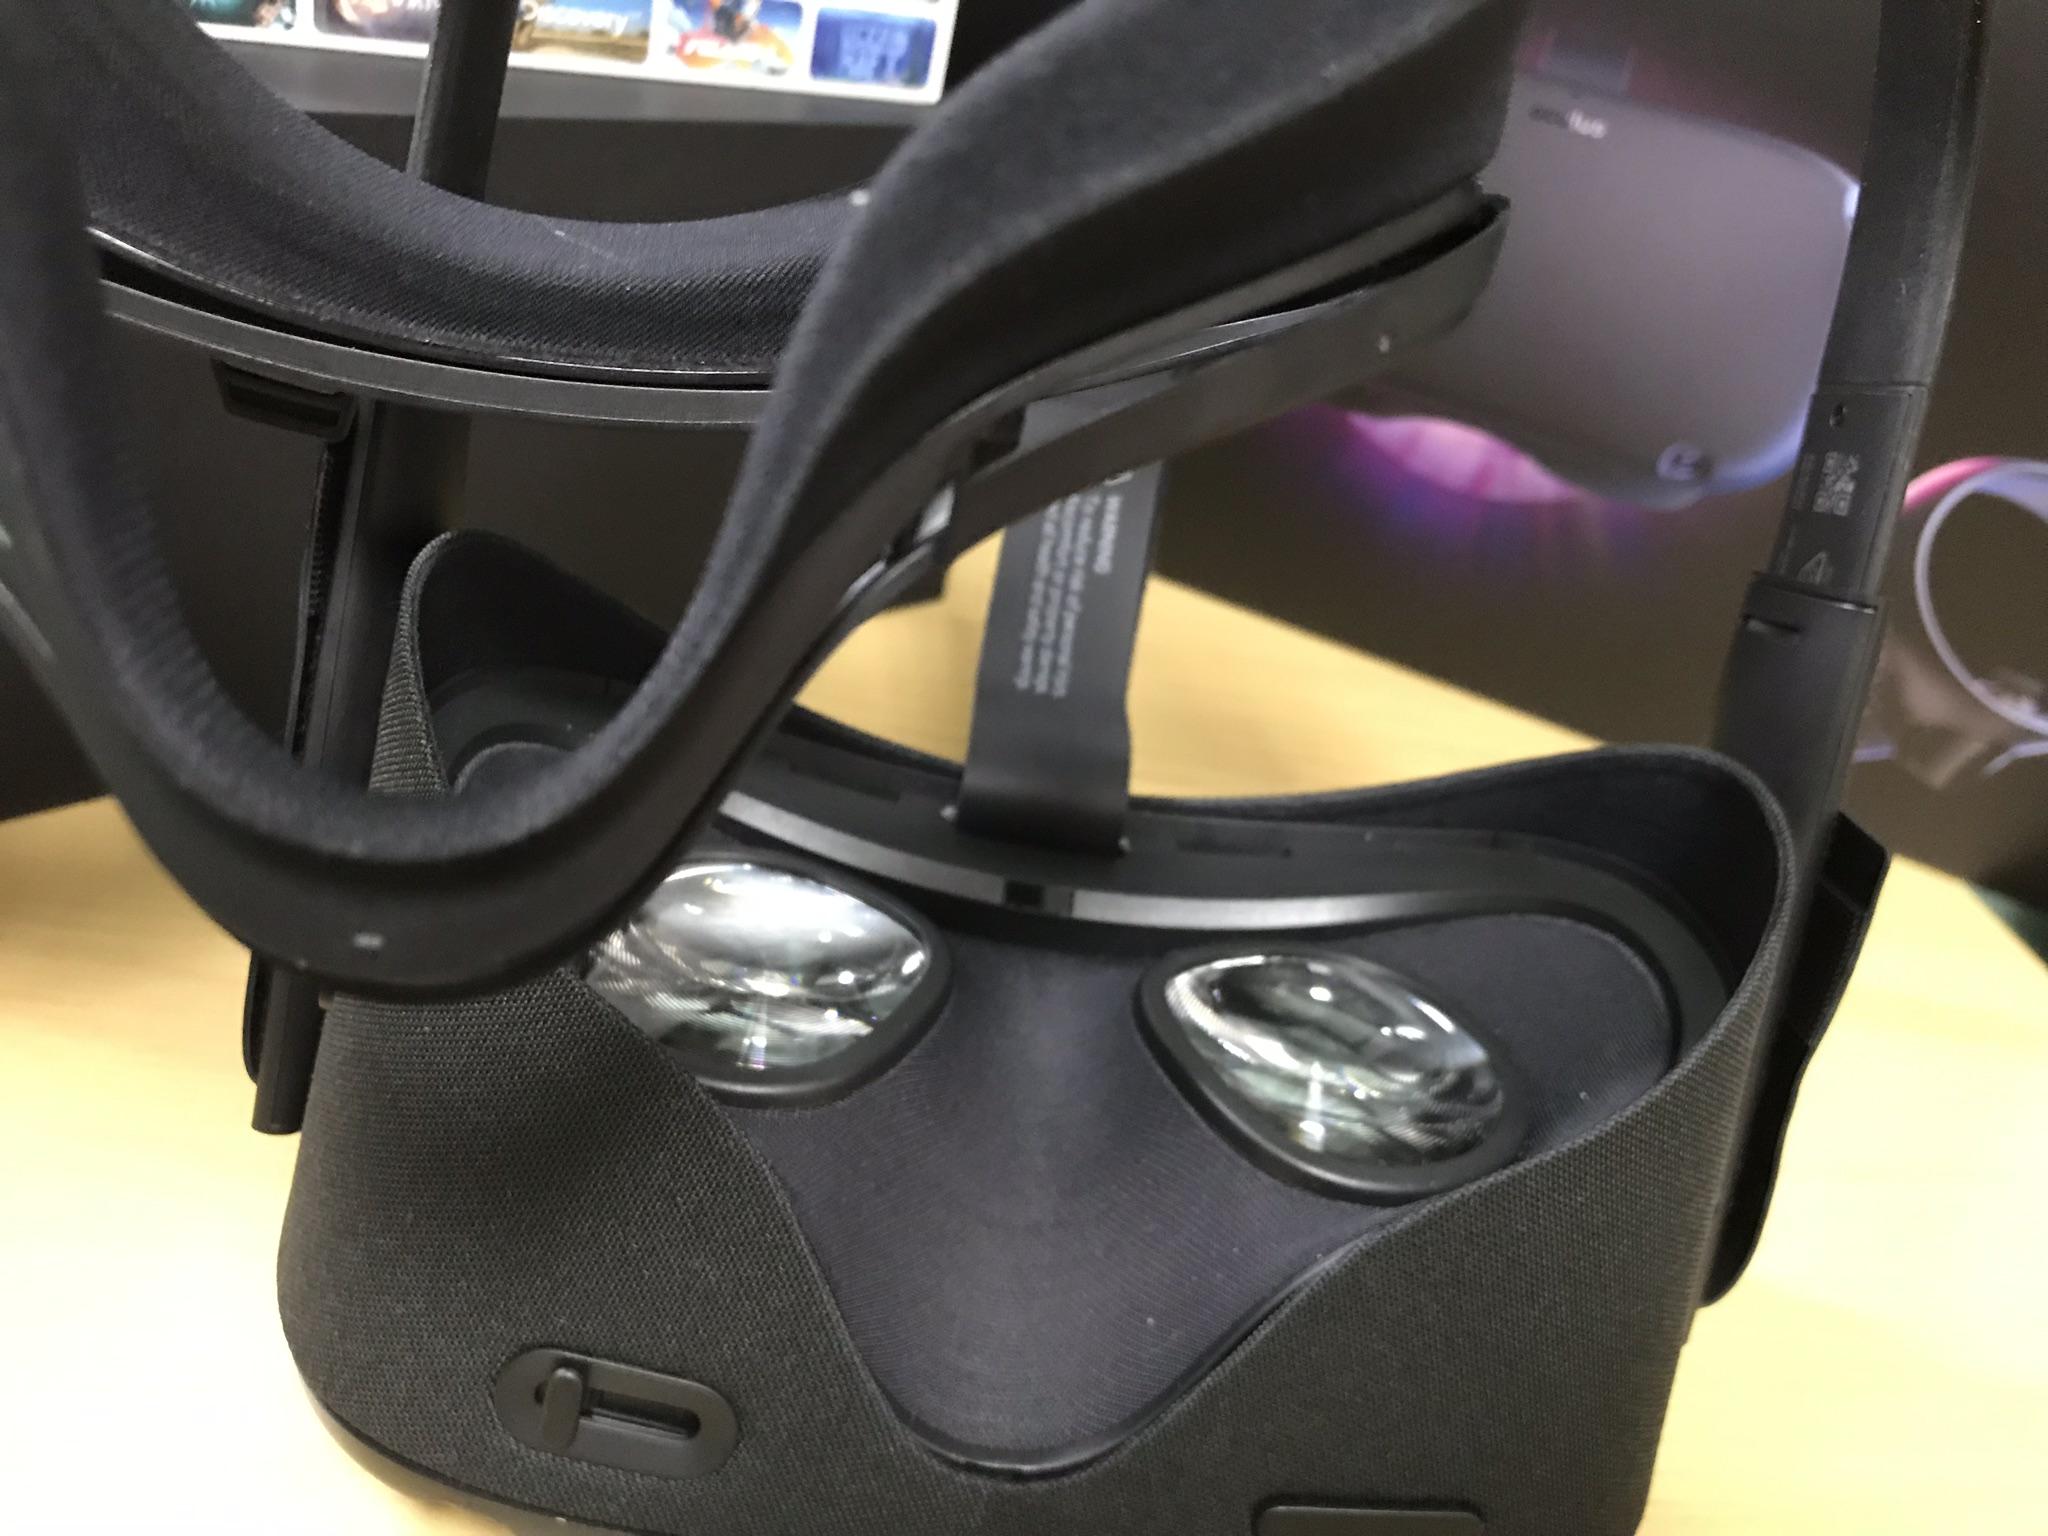 Oculus Quest 運動不足解消になるVRゲーム!! 汗対策でVRゴーグルの汚れ防止